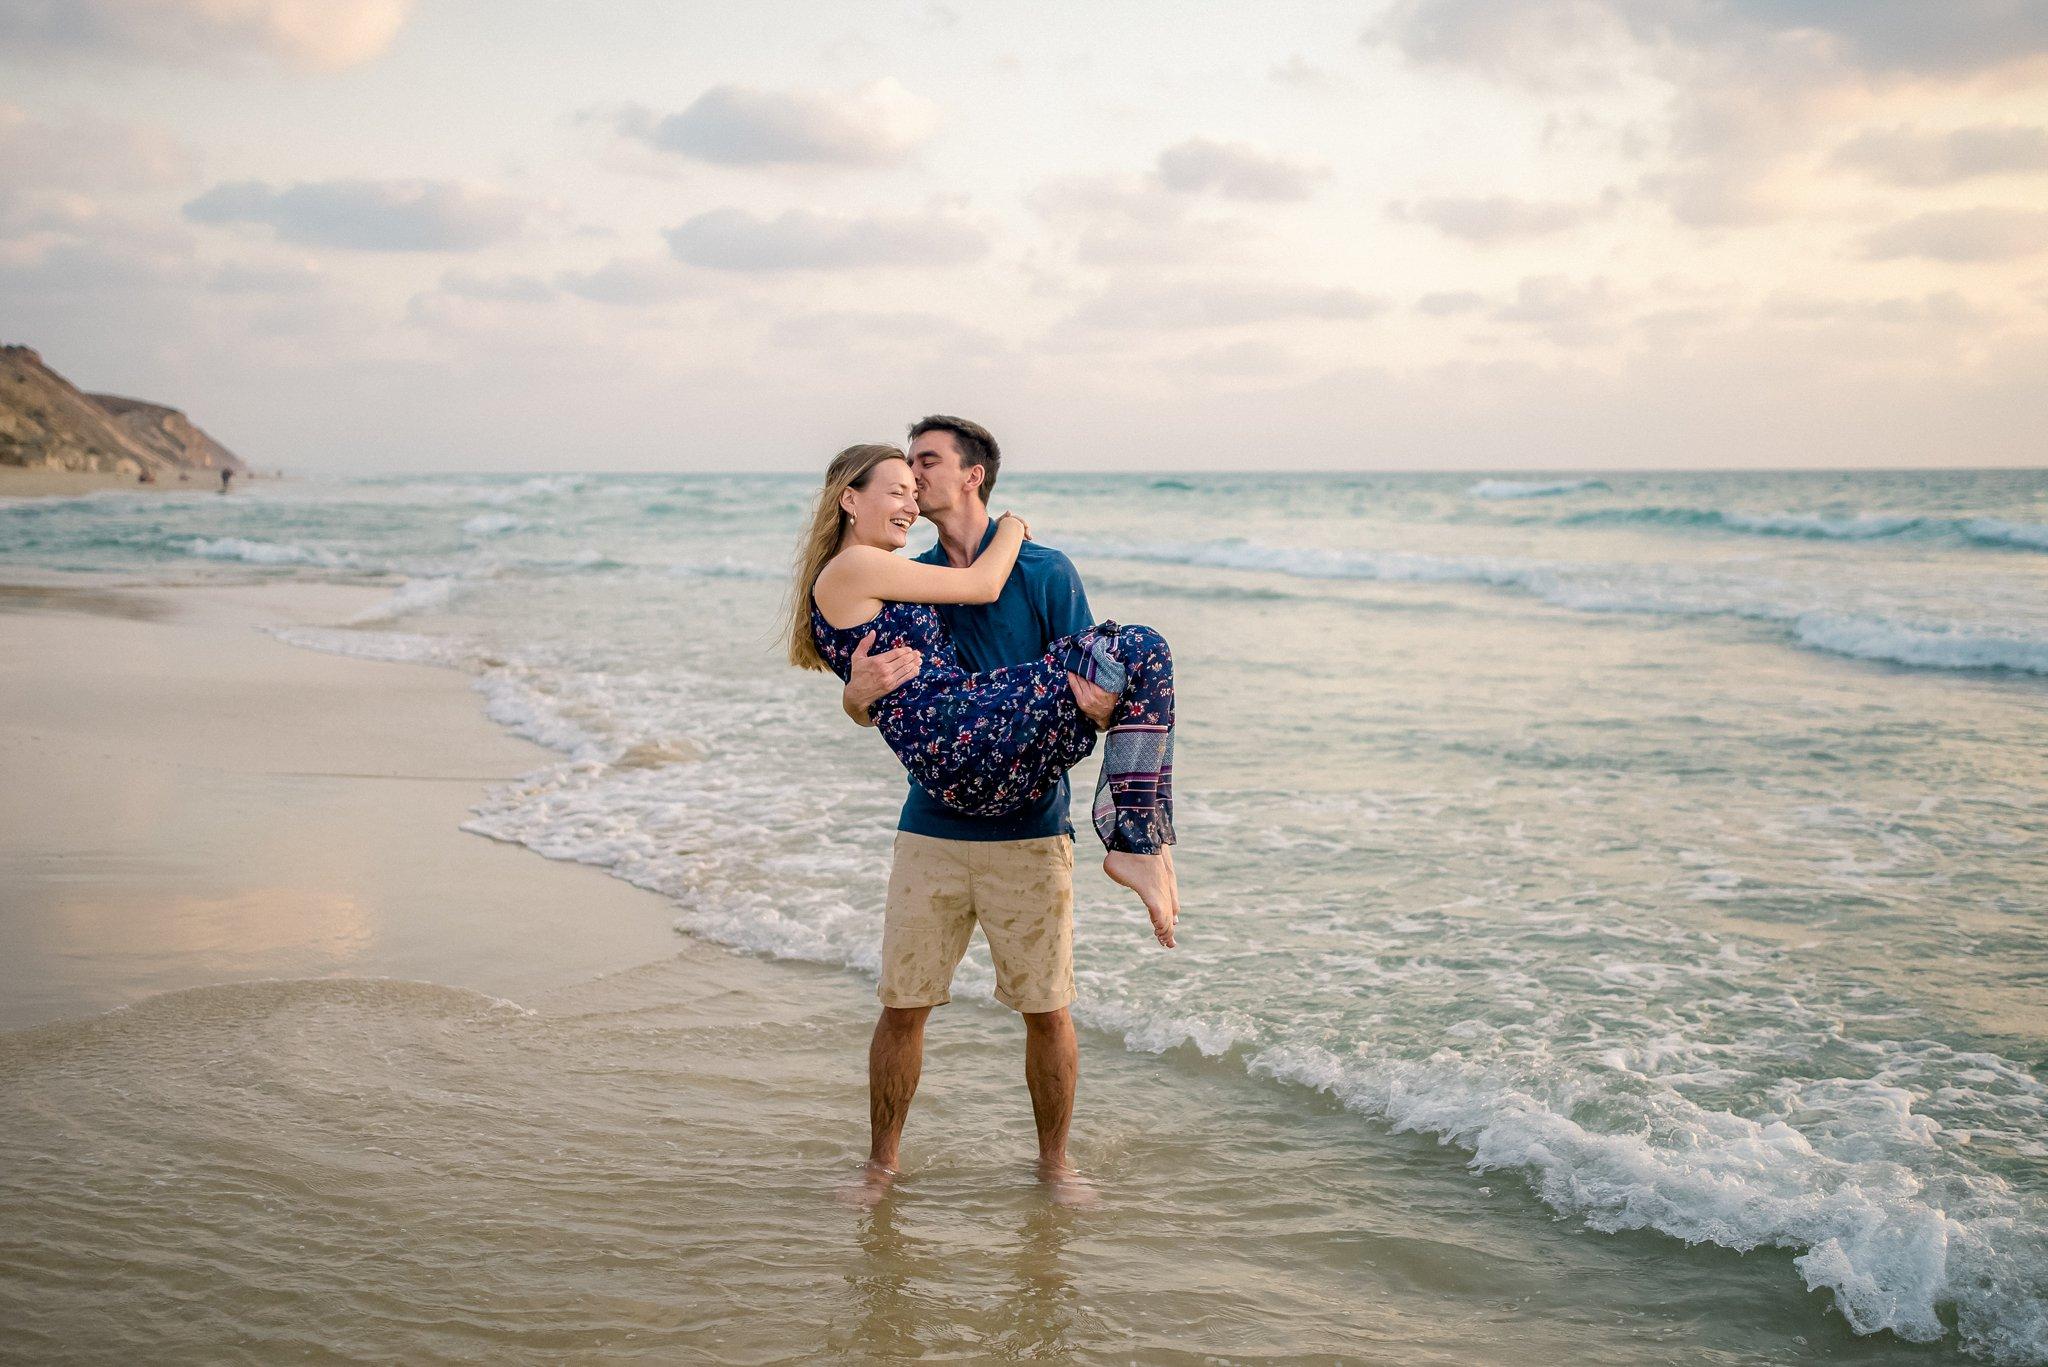 Netanya-israel-beach-engagement-session-kate-giryes-photography-3882_WEB.jpg